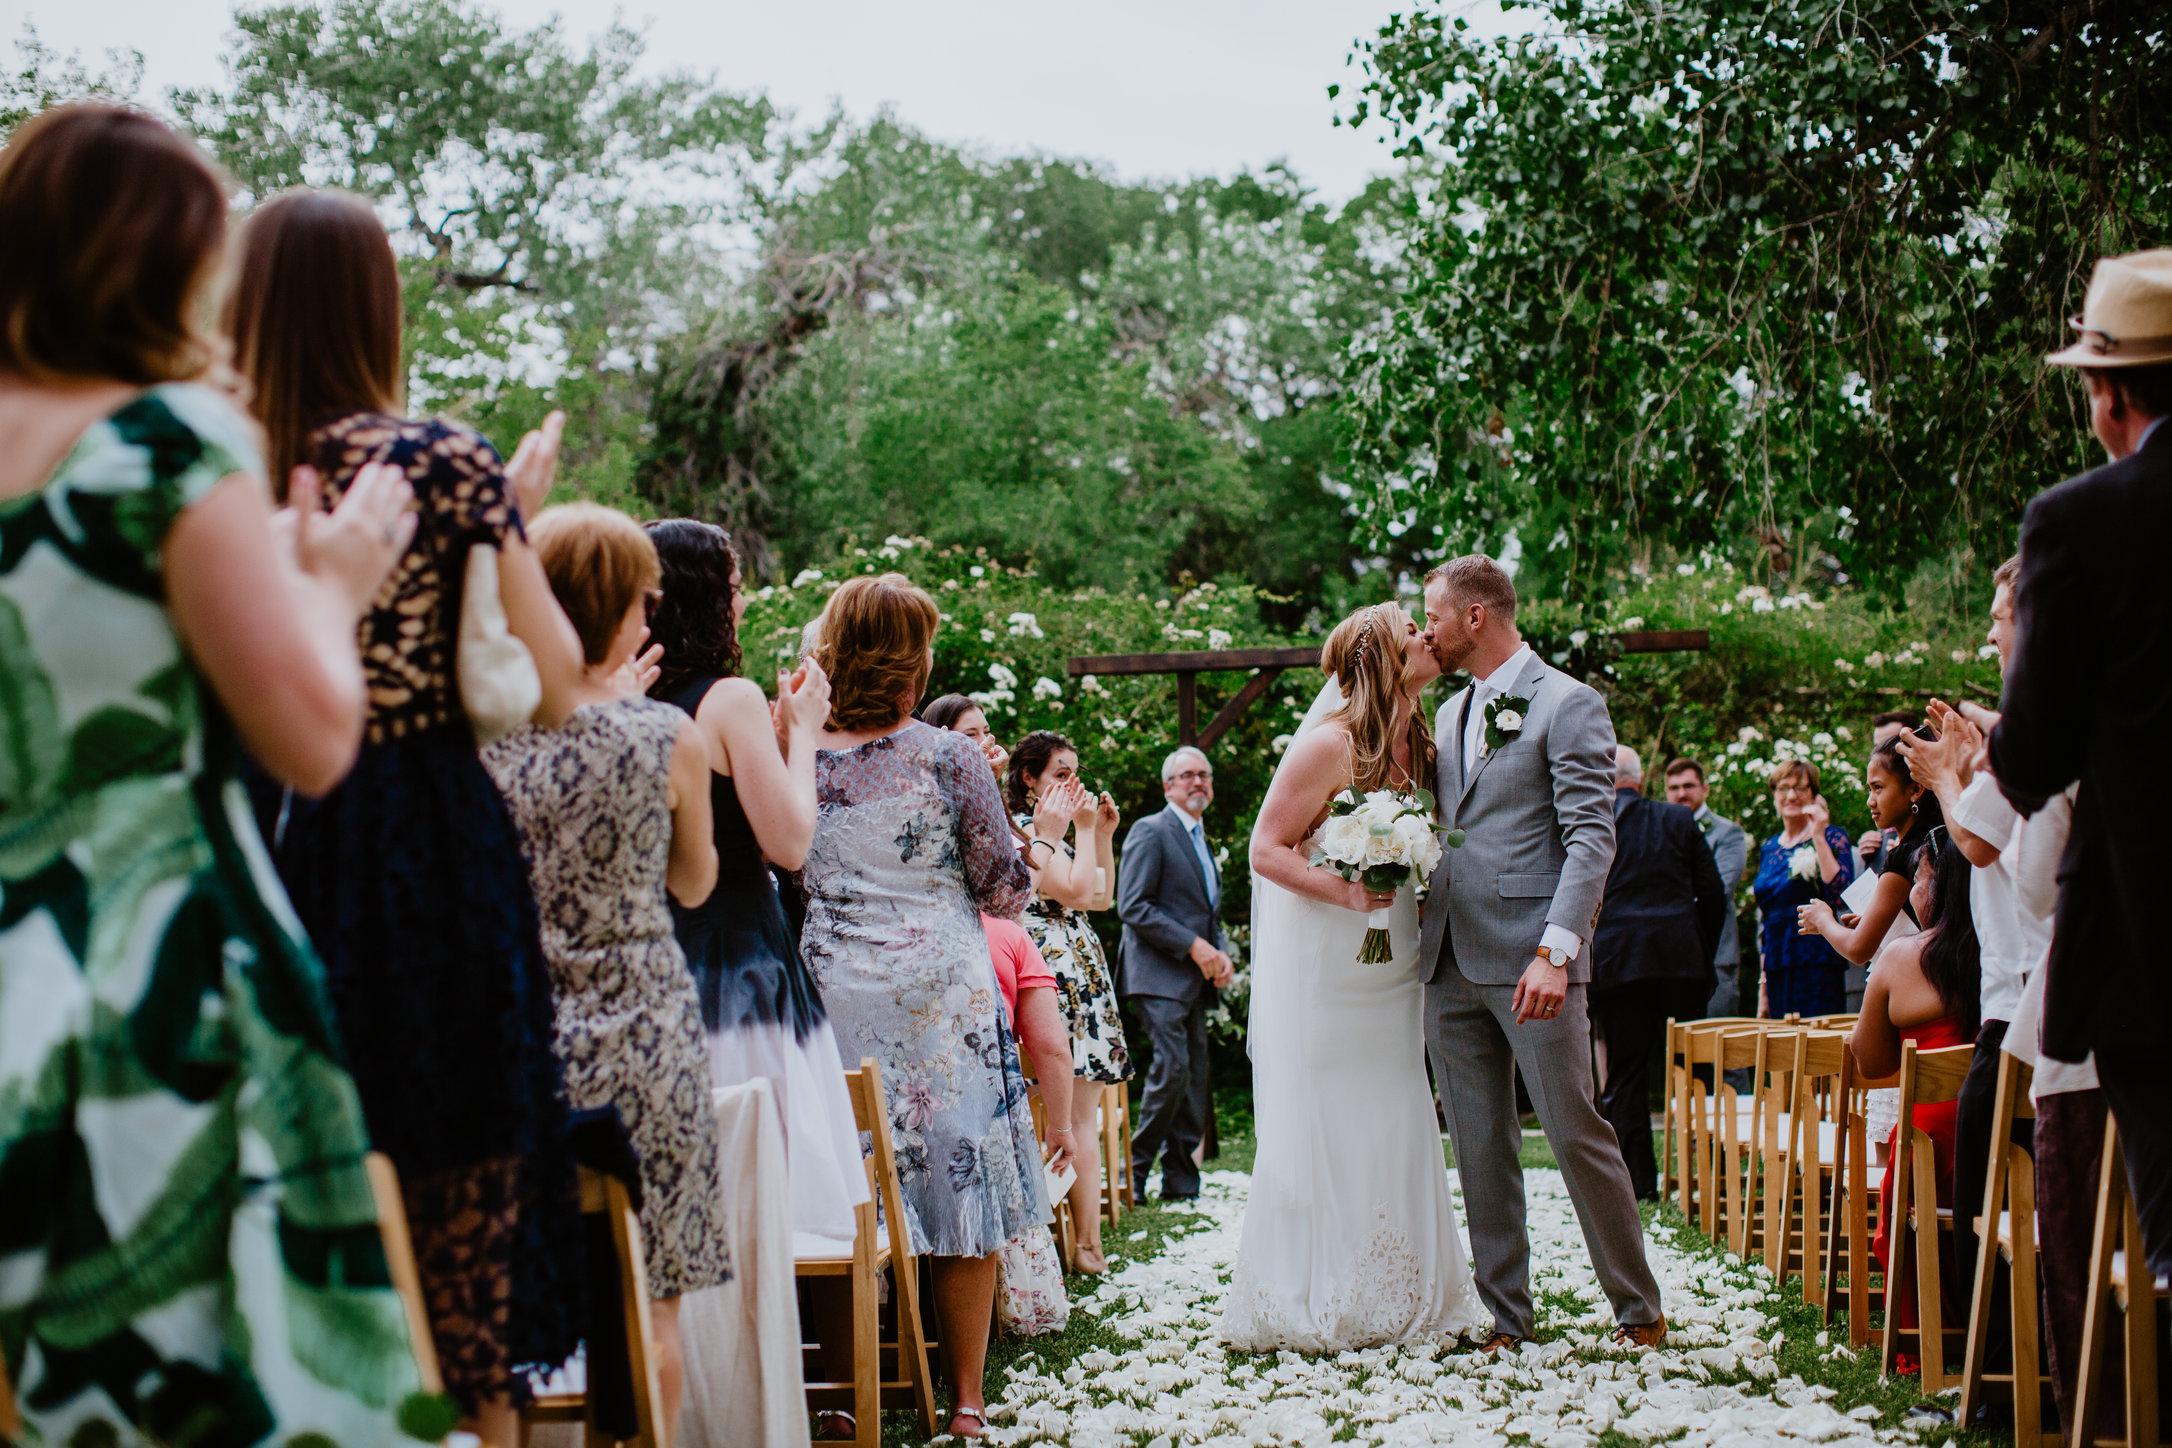 DandA-wedding-336.jpg